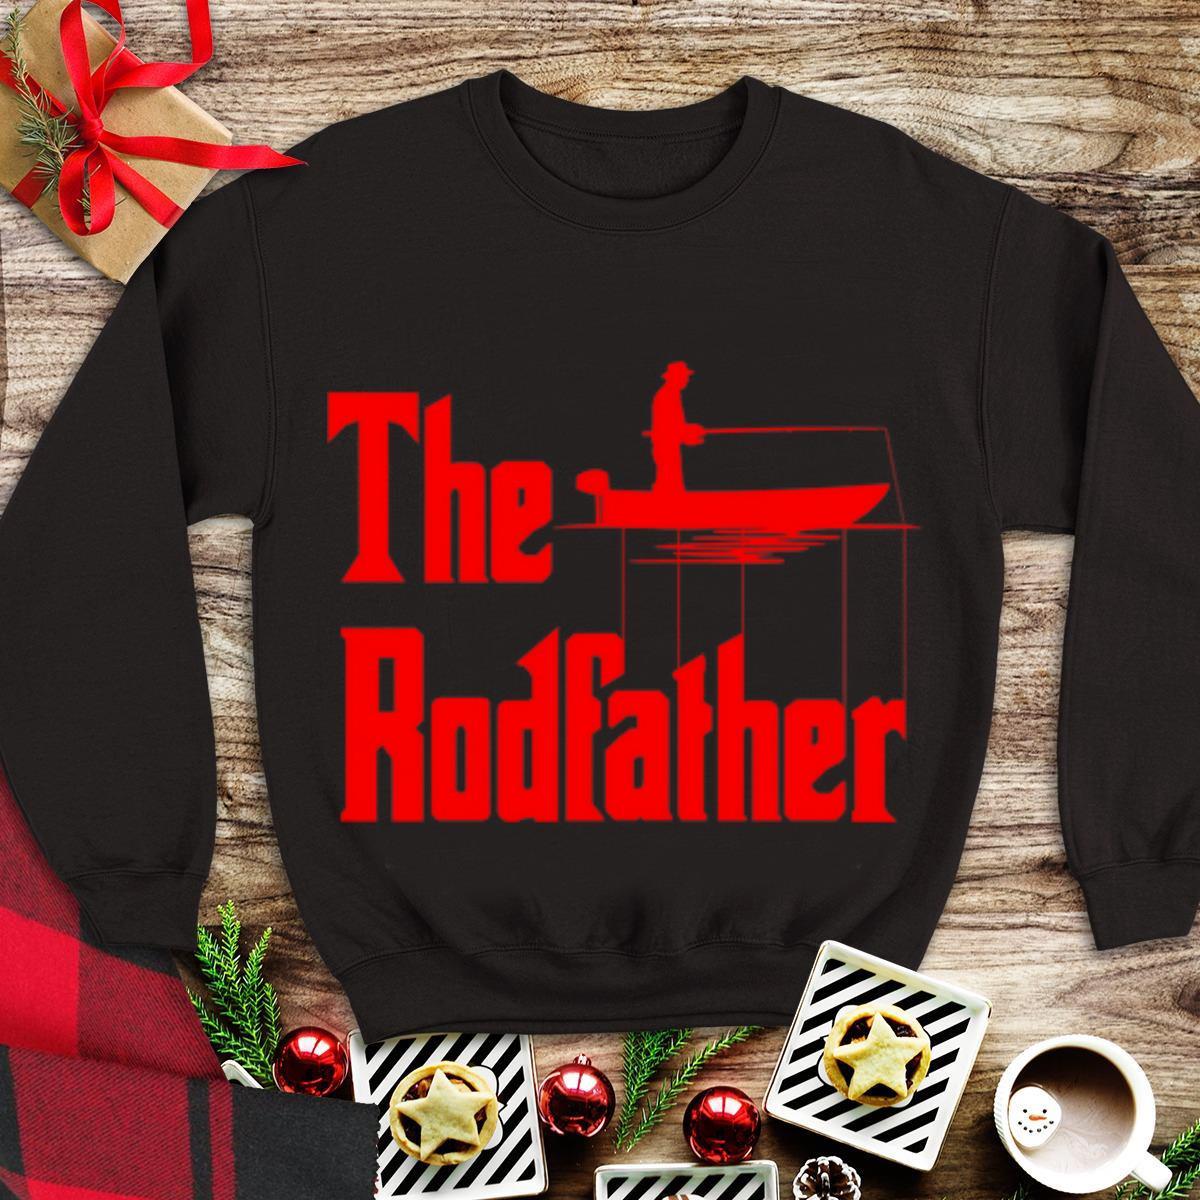 The Rodfather Fisherman shirt 1 - The Rodfather Fisherman shirt